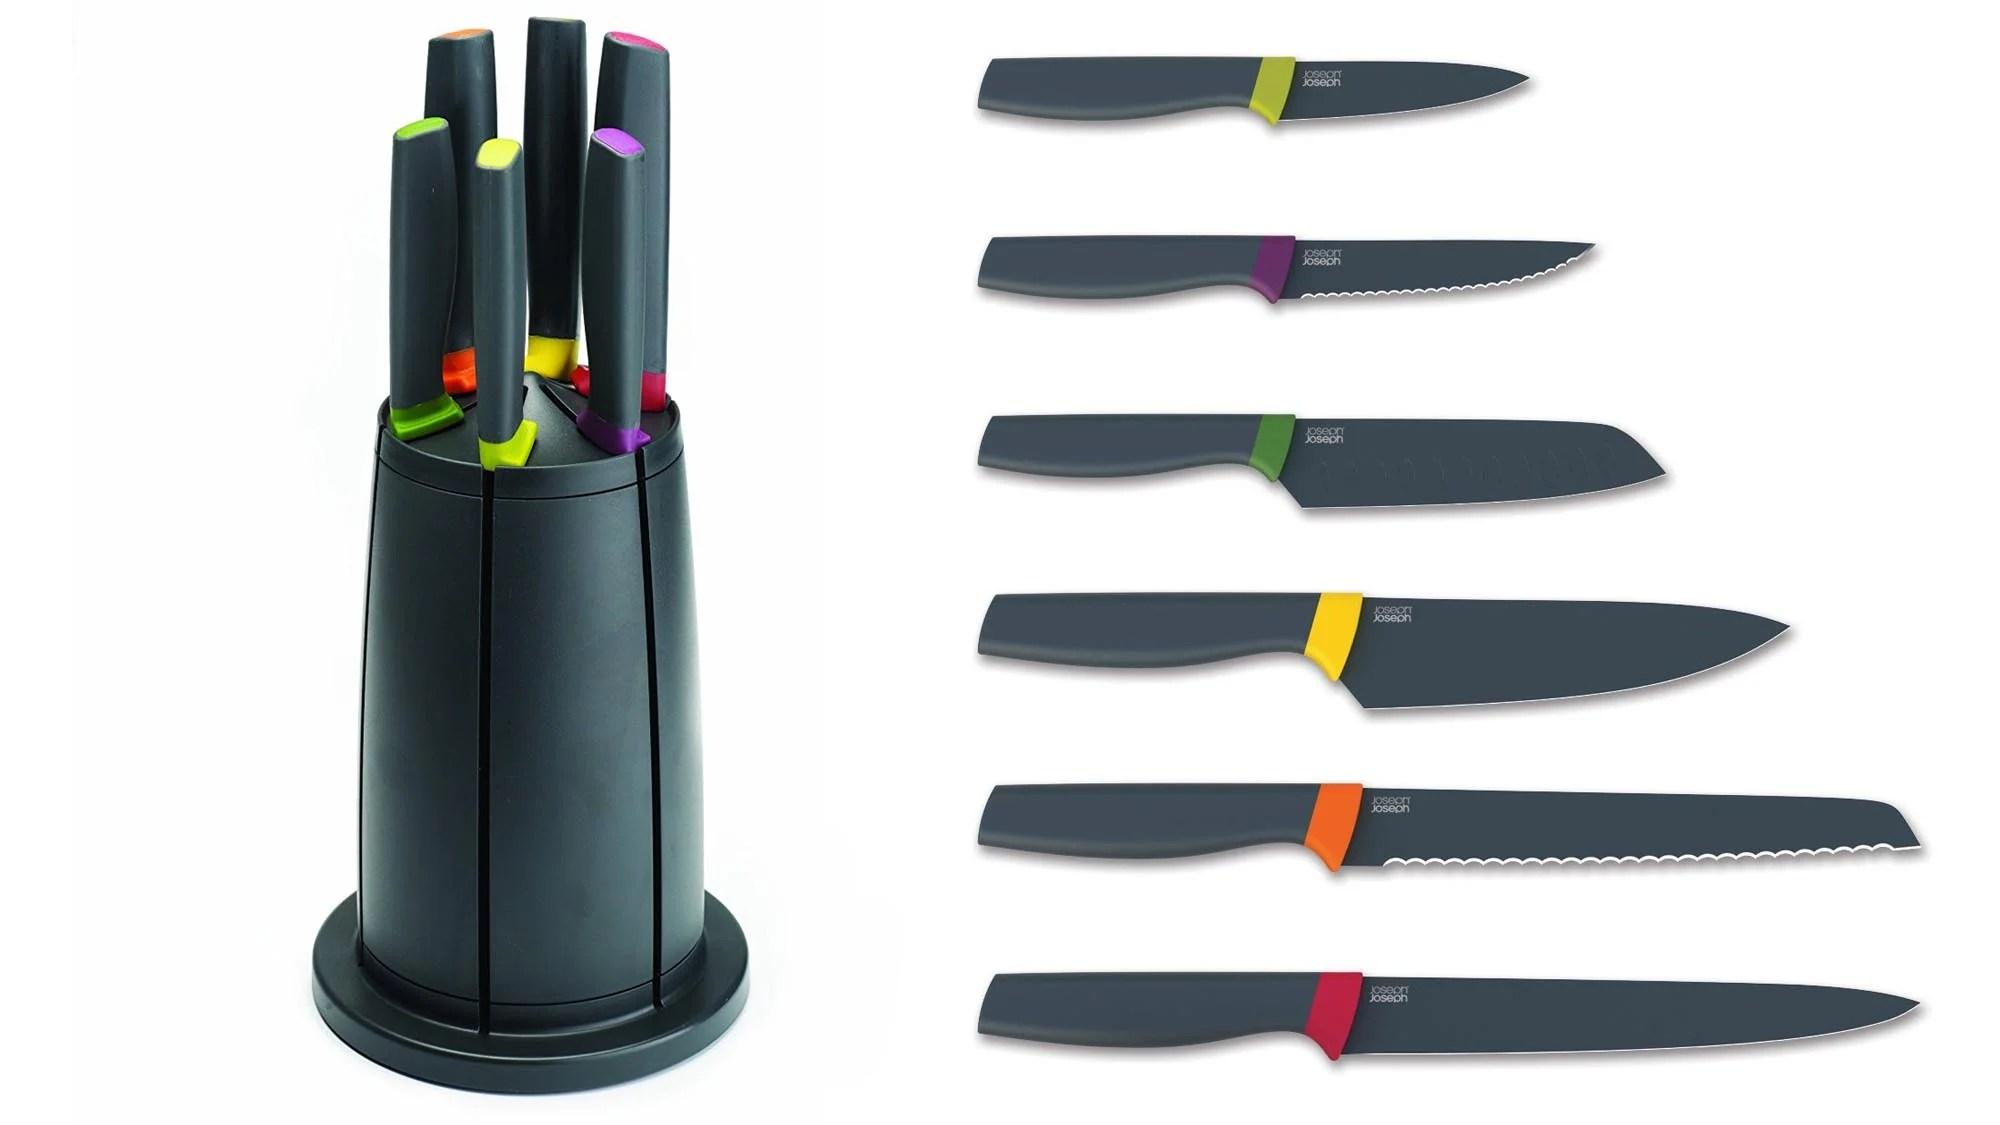 joseph kitchen knives bulletin board best stay sharp with the knife sets